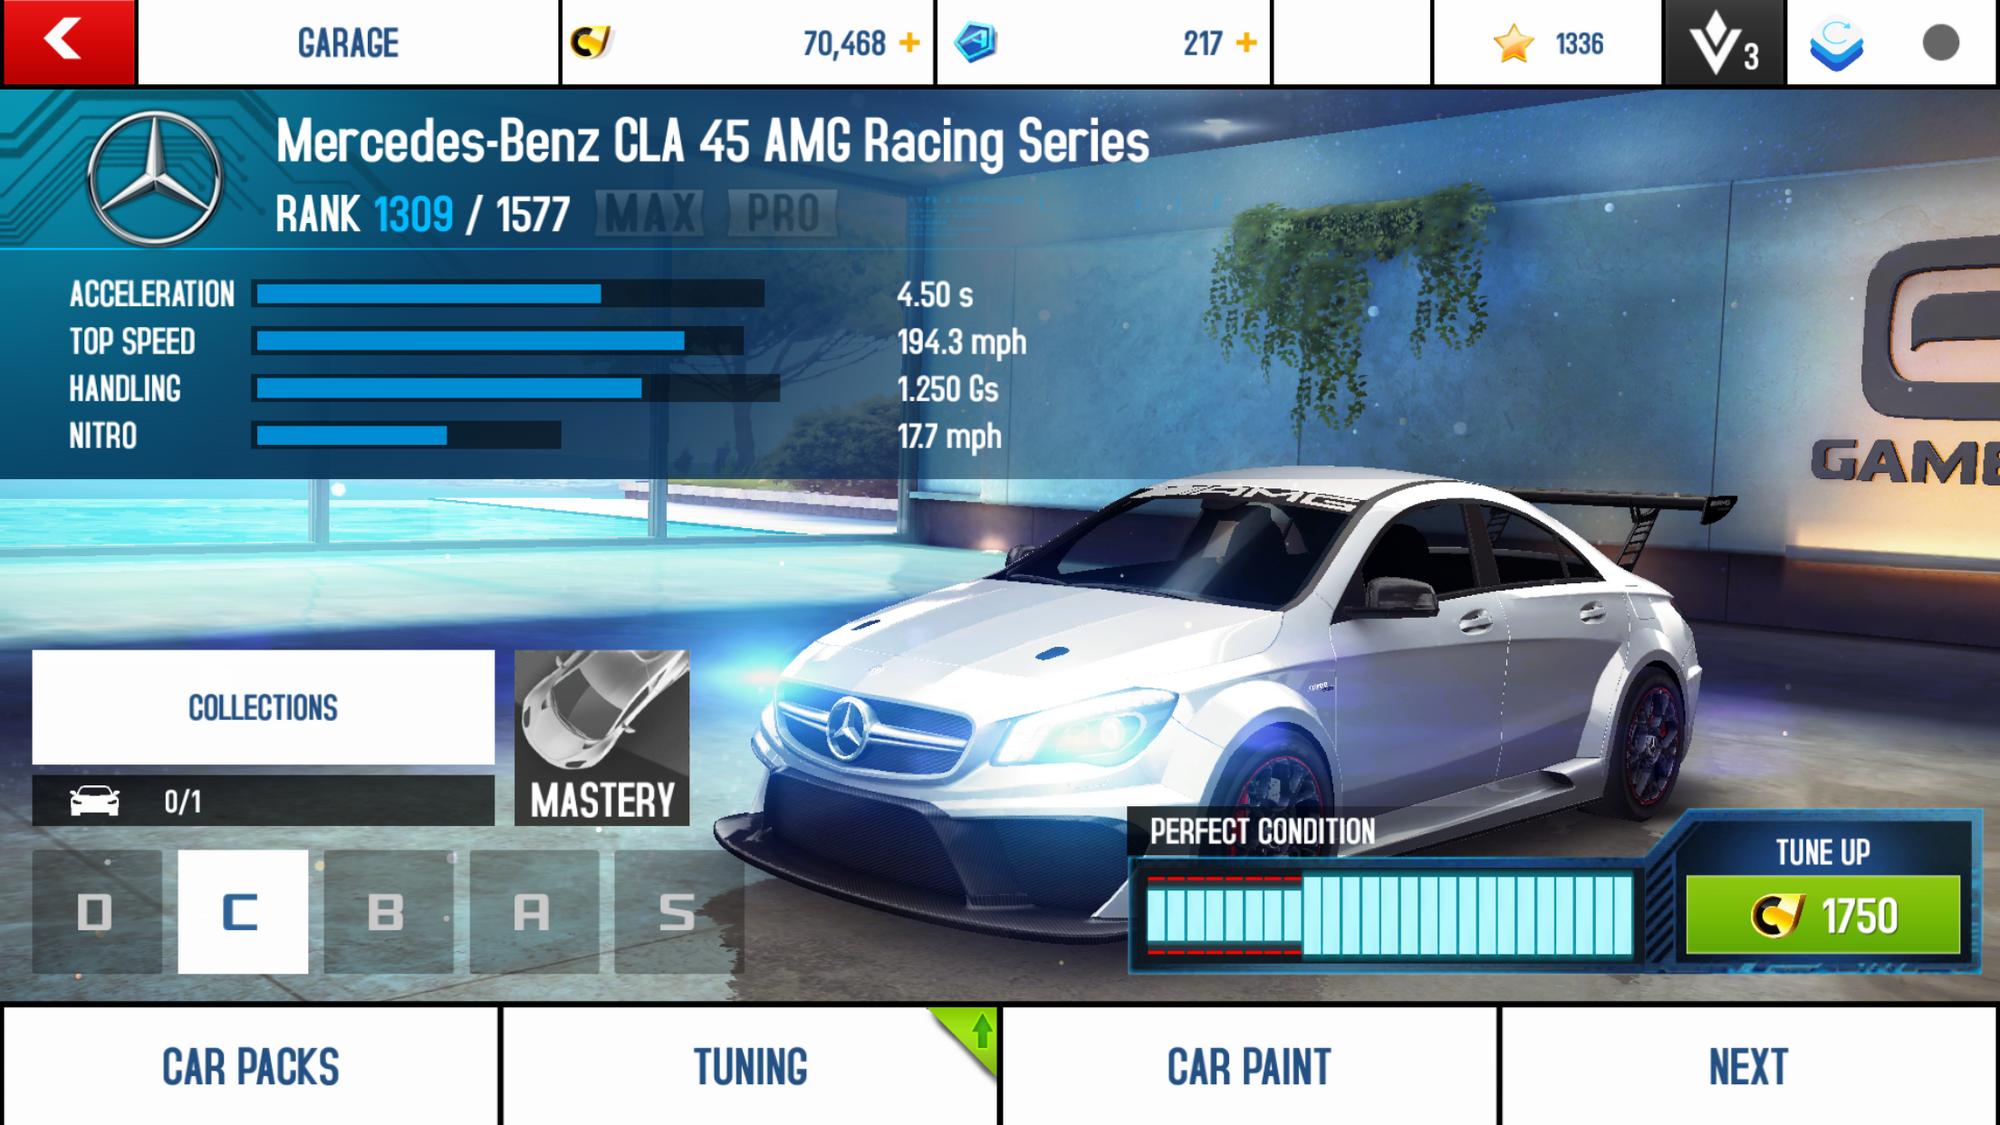 Mercedes benz cla 45 amg racing series asphalt wiki for Mercedes benz biome wiki